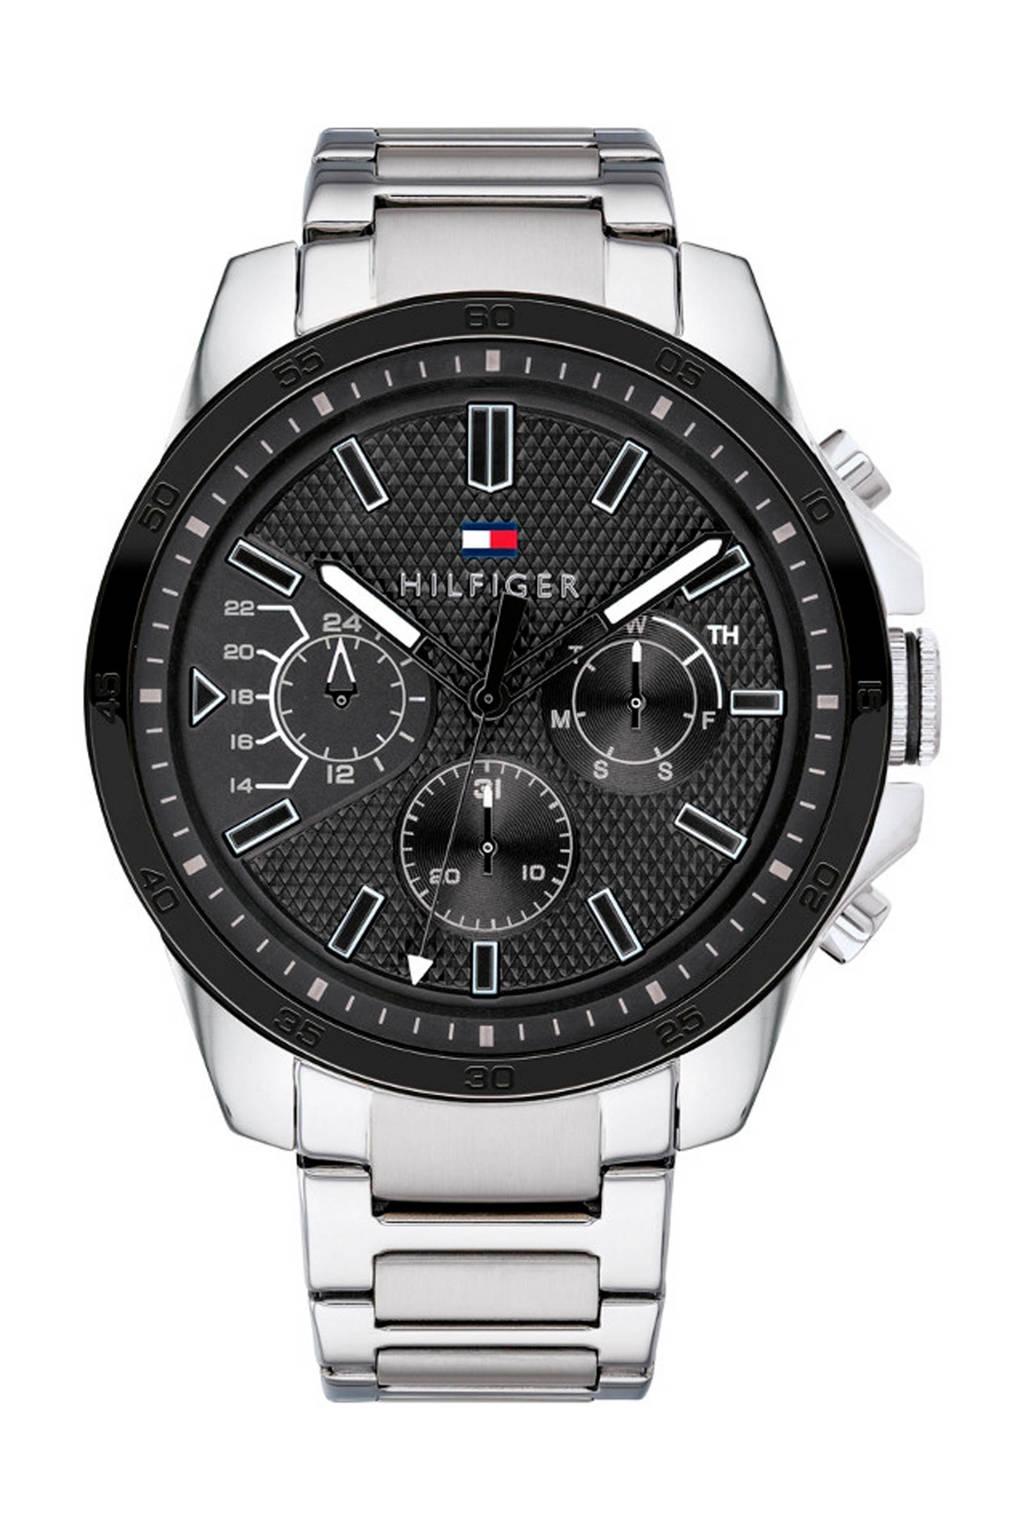 Tommy Hilfiger horloge TH1791564, zwart/zilverkleurig